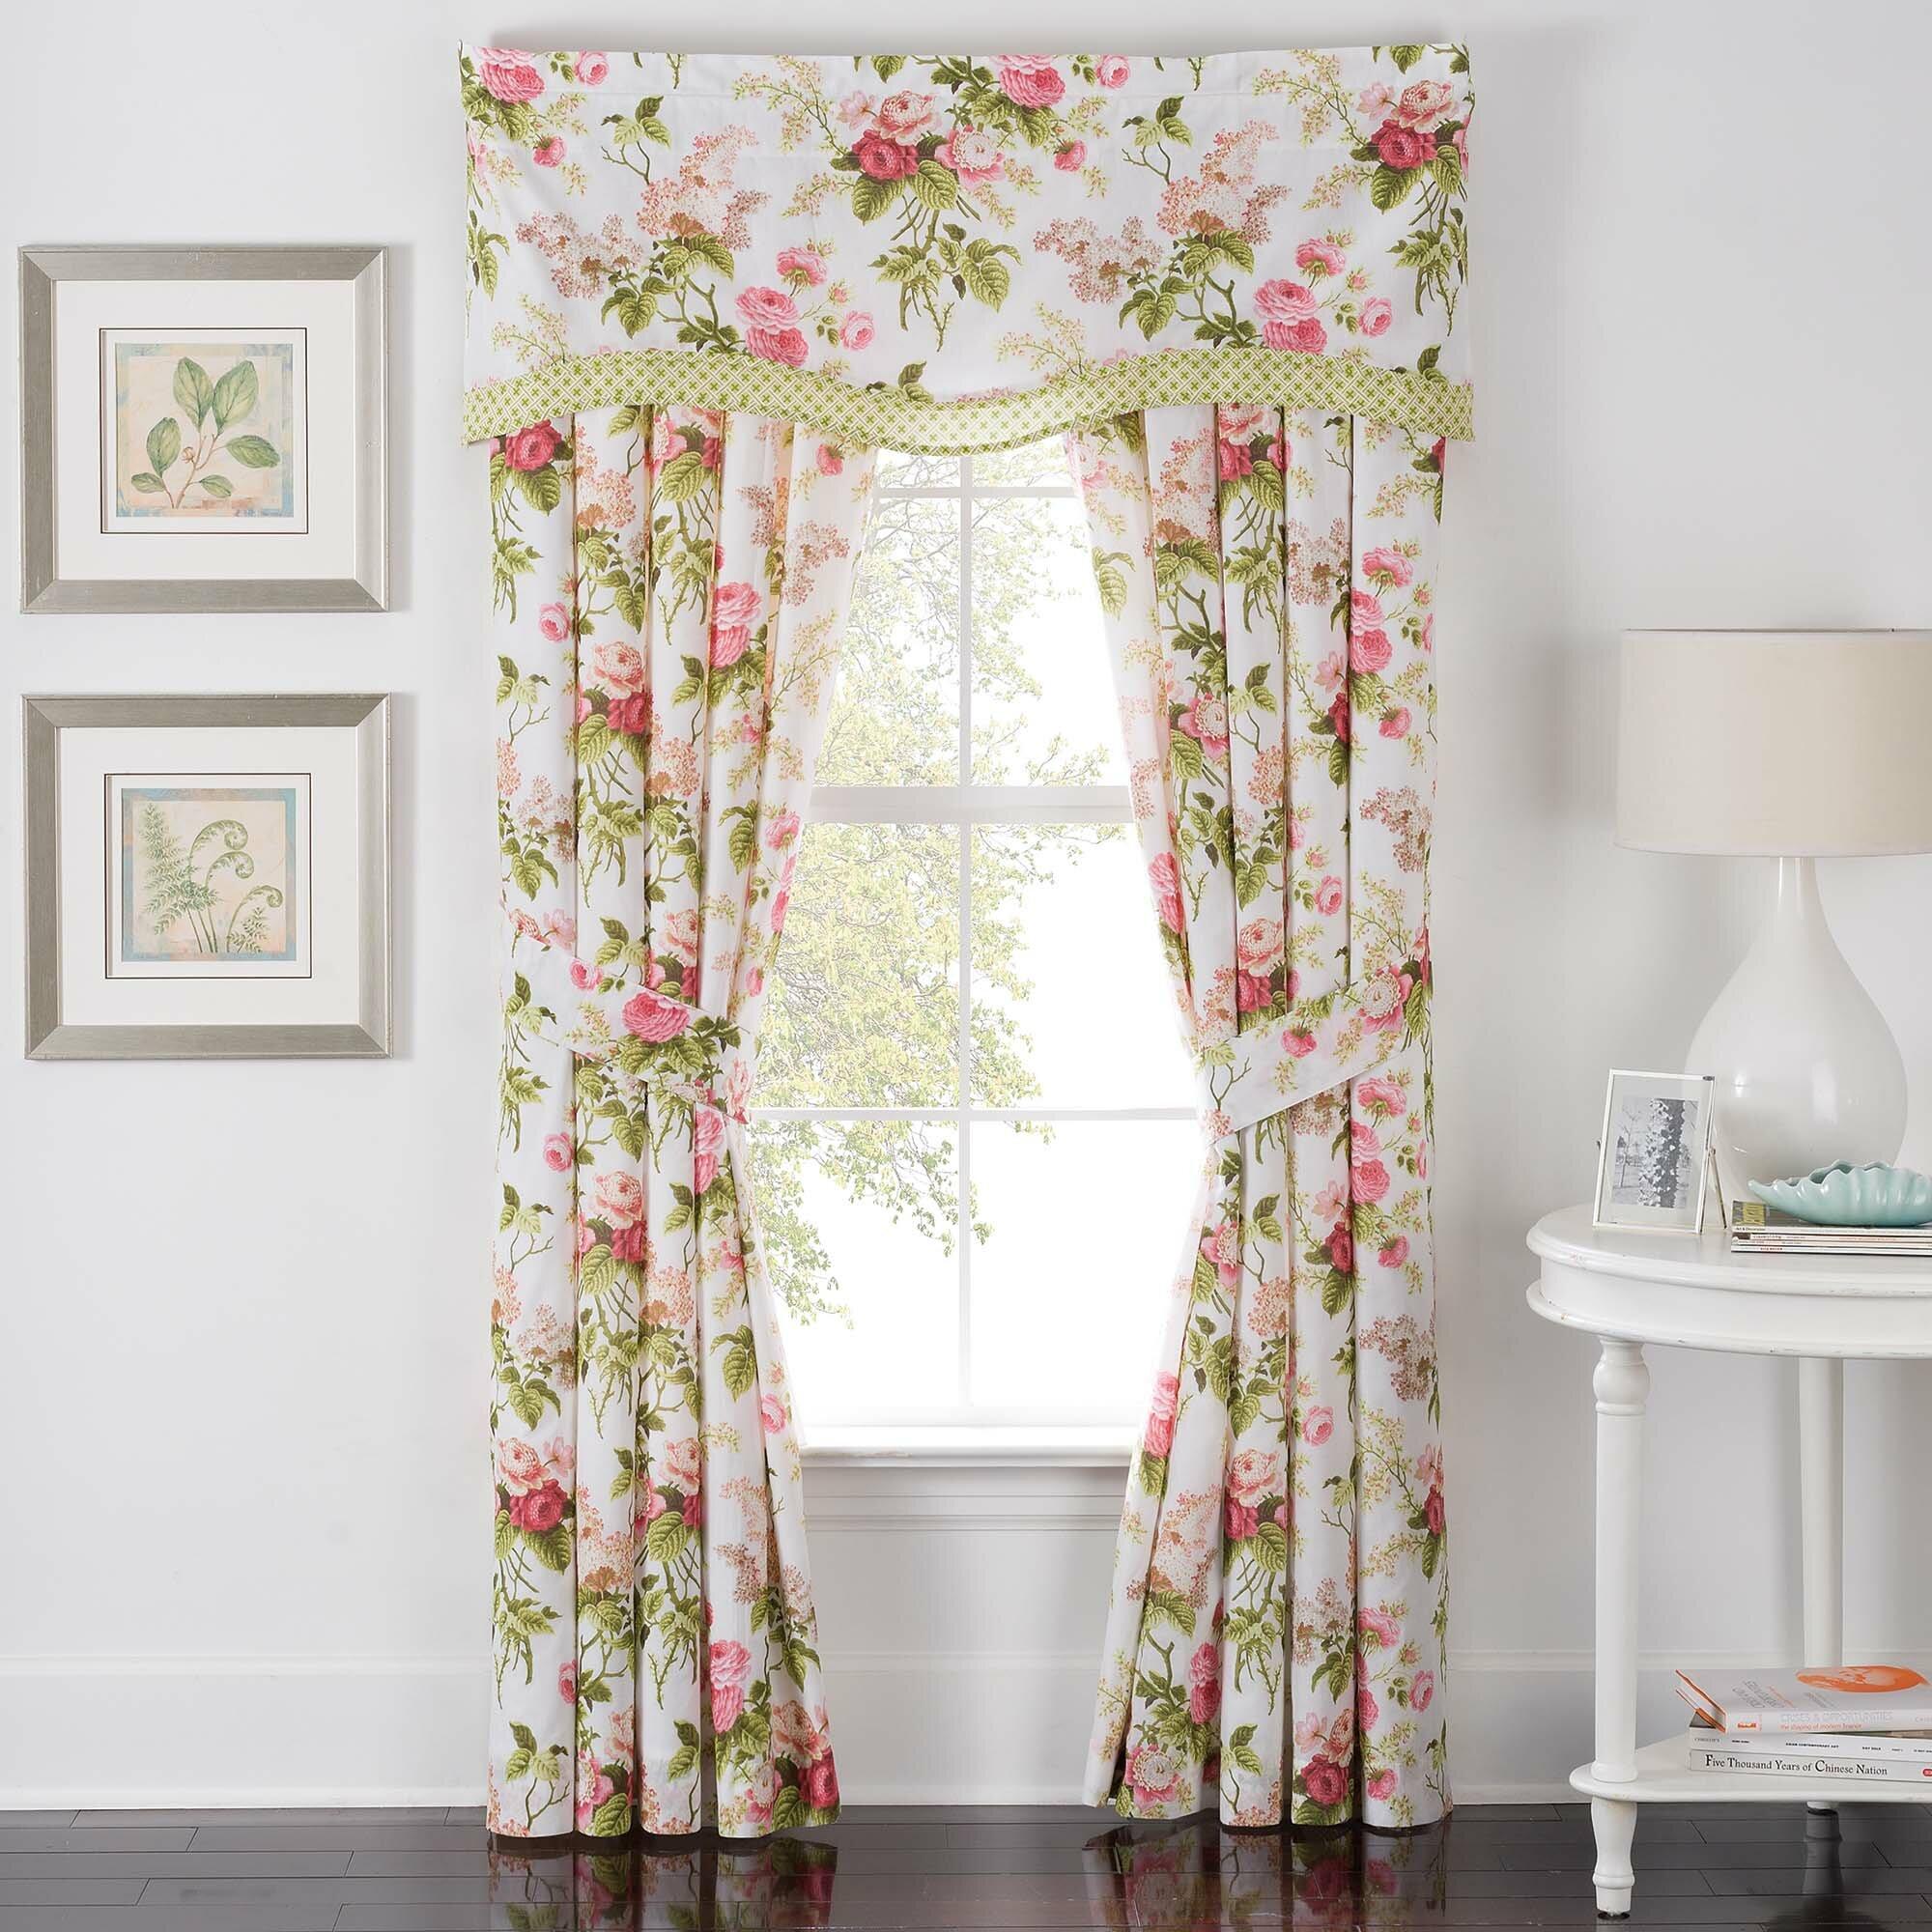 Curtains amp drapes 84 quot 94 quot length curtains amp drapes waverly sku